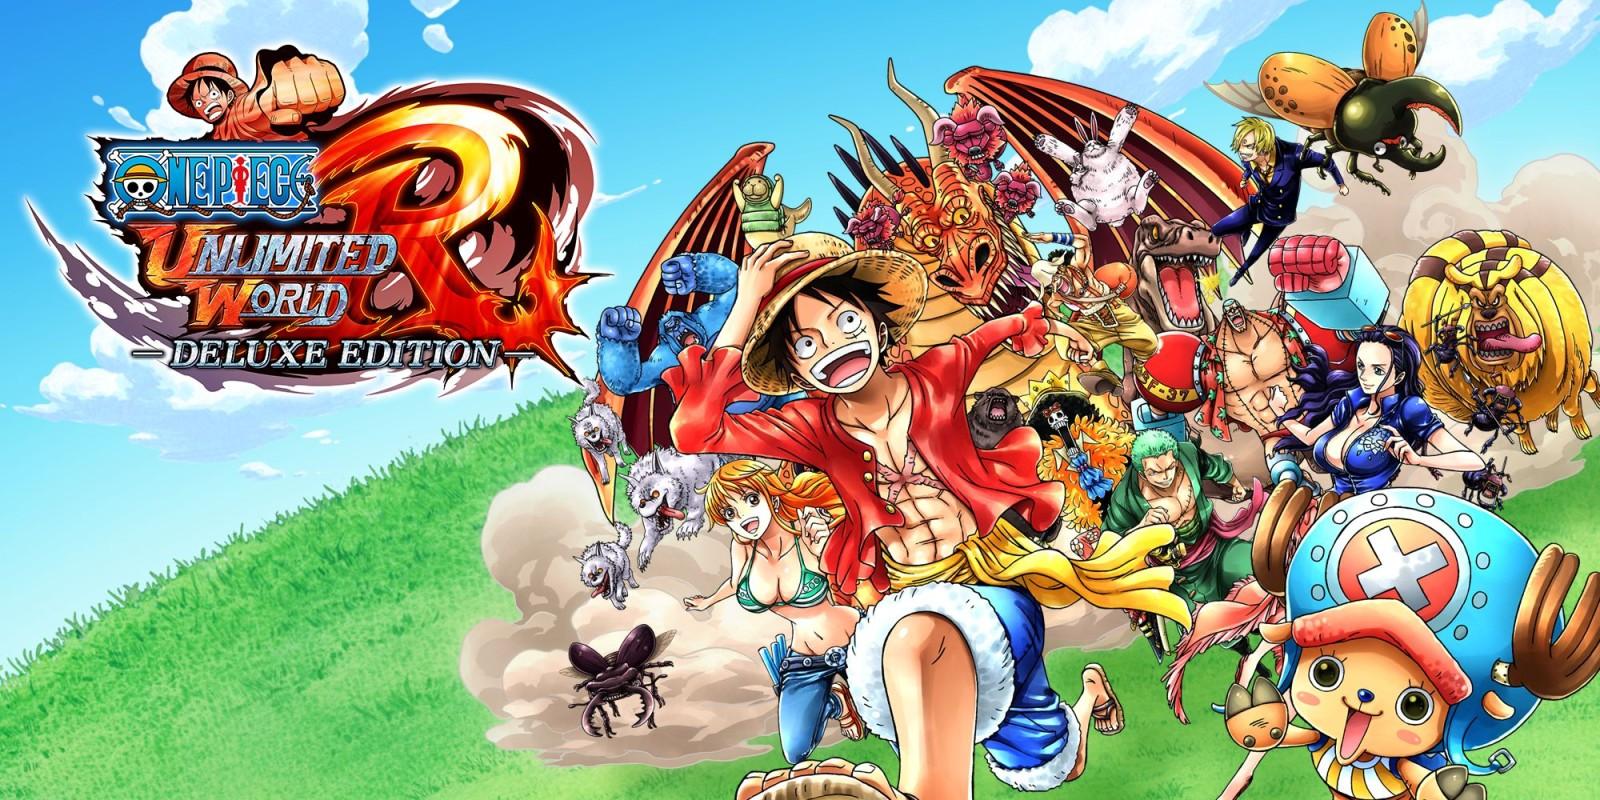 Zelda Hd Wallpaper One Piece Unlimited World Red Deluxe Edition Nintendo